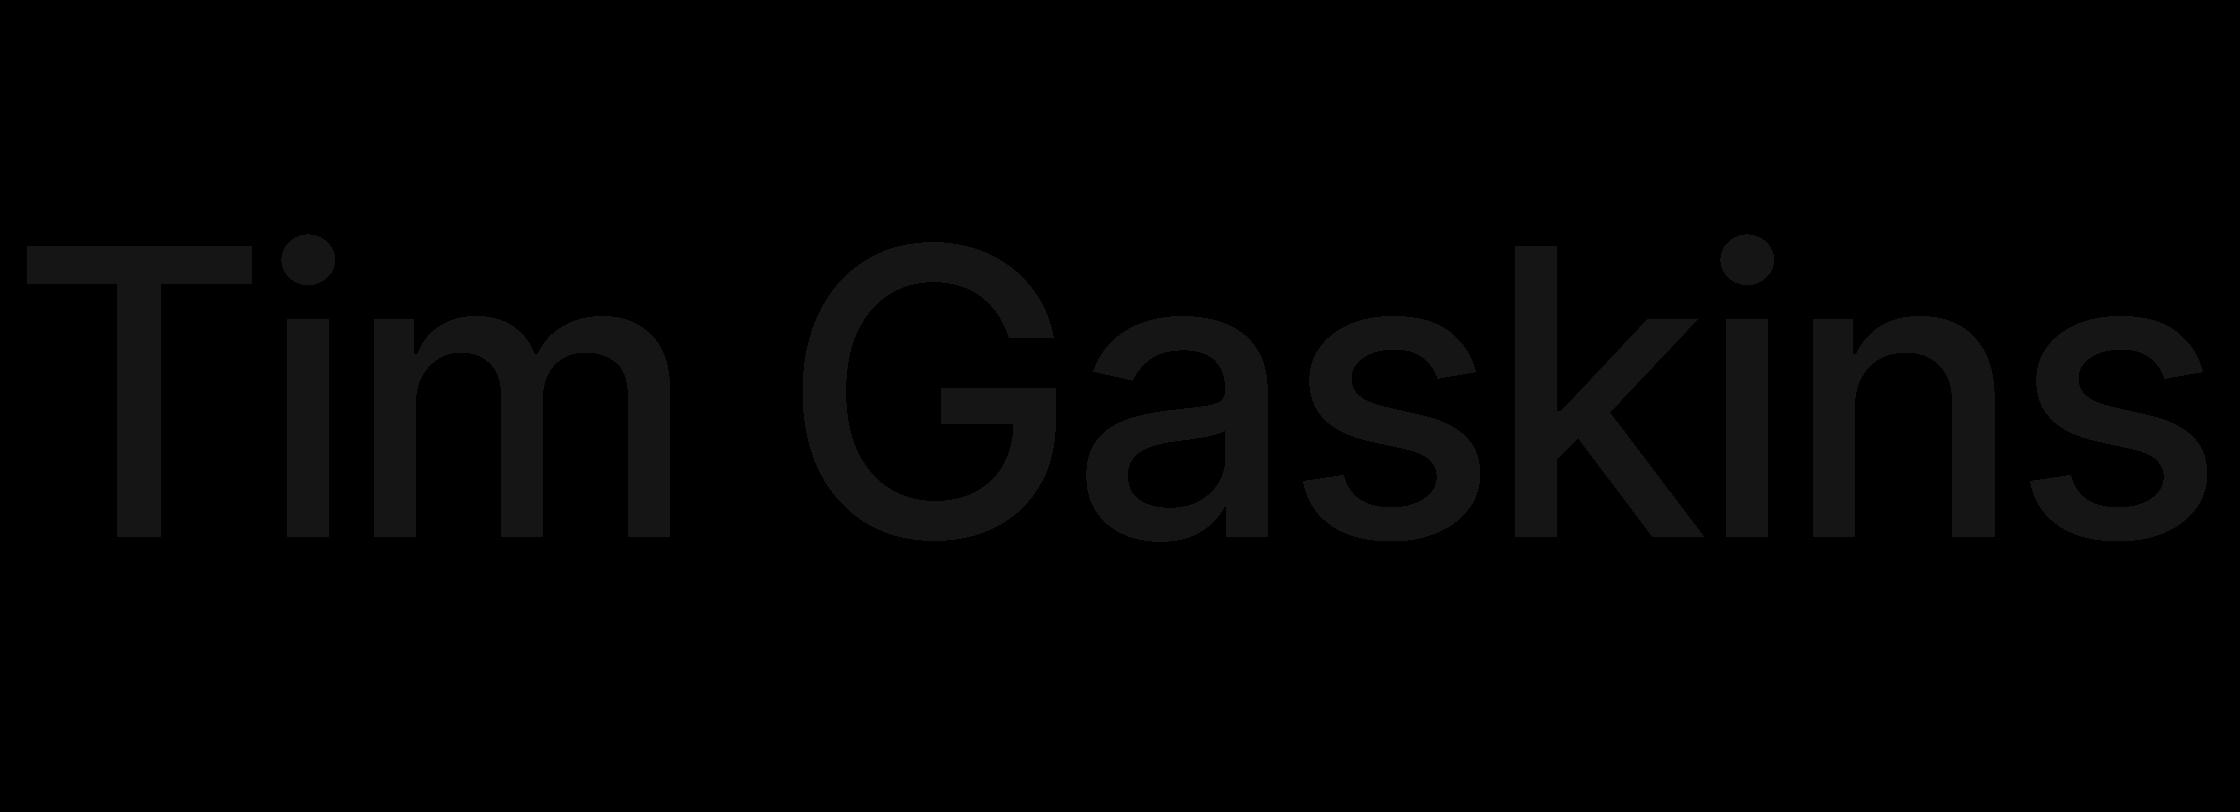 Tim Gaskins